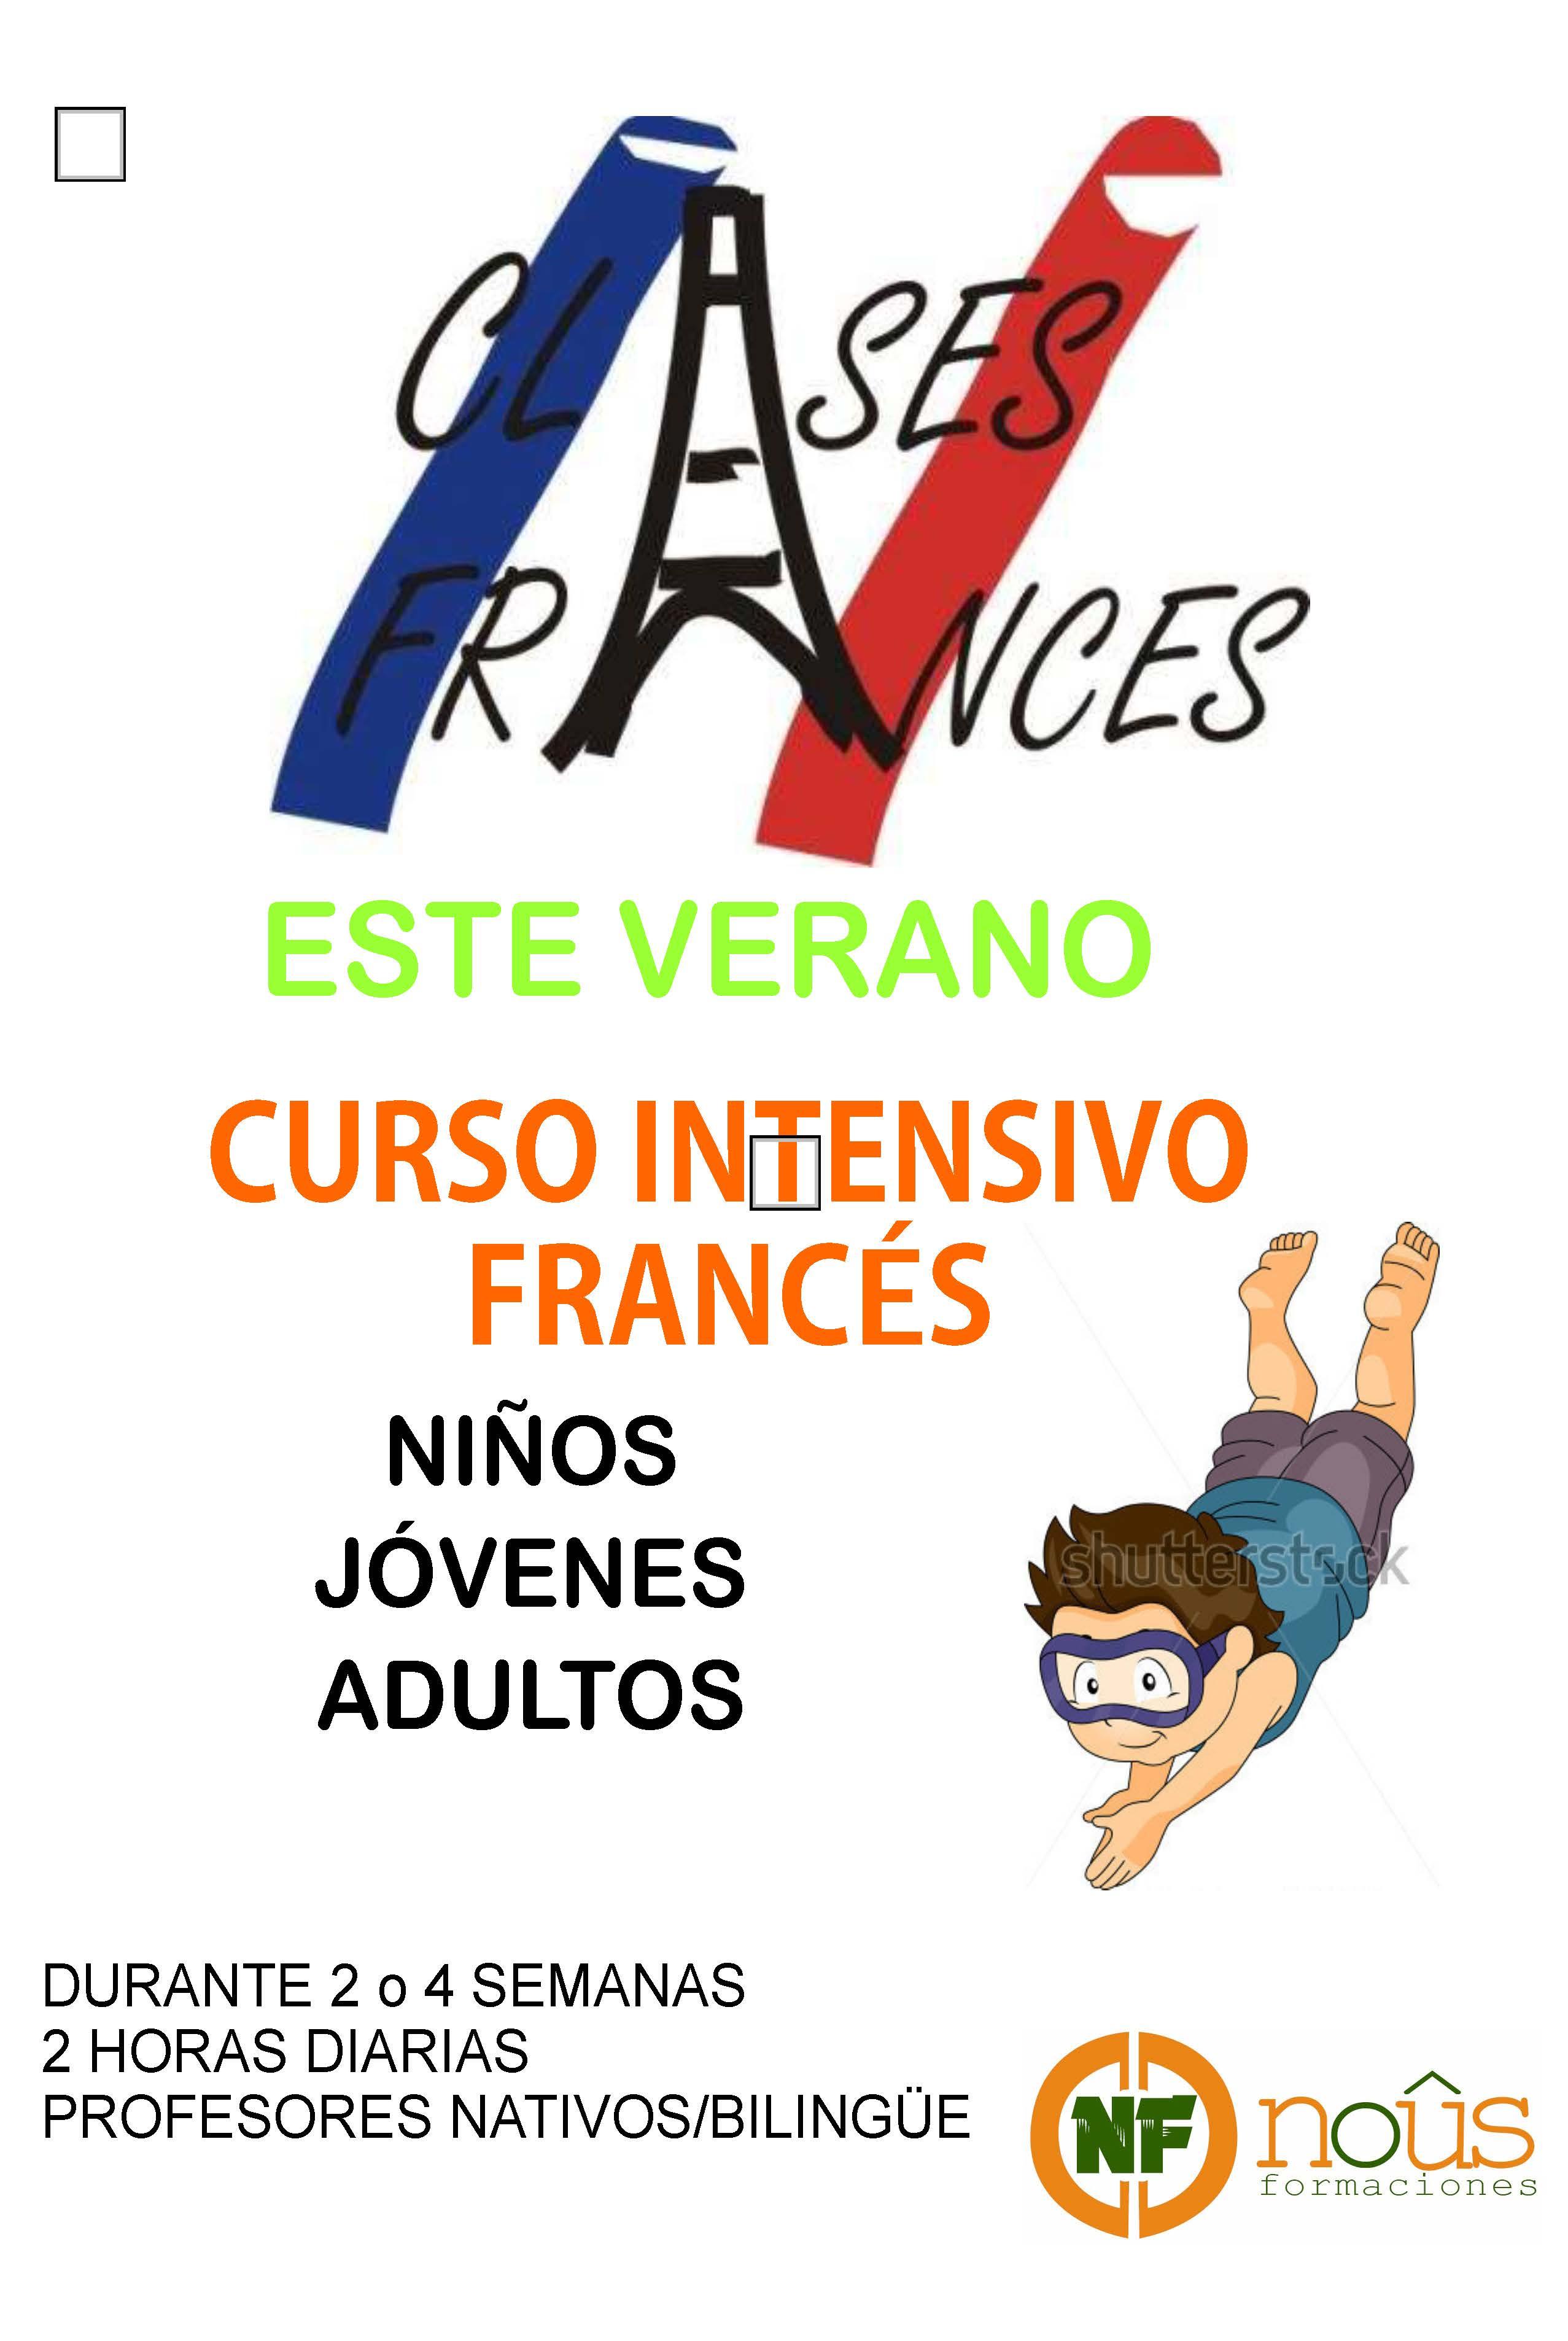 CURSO INTENSIVO INGLÉS y francés